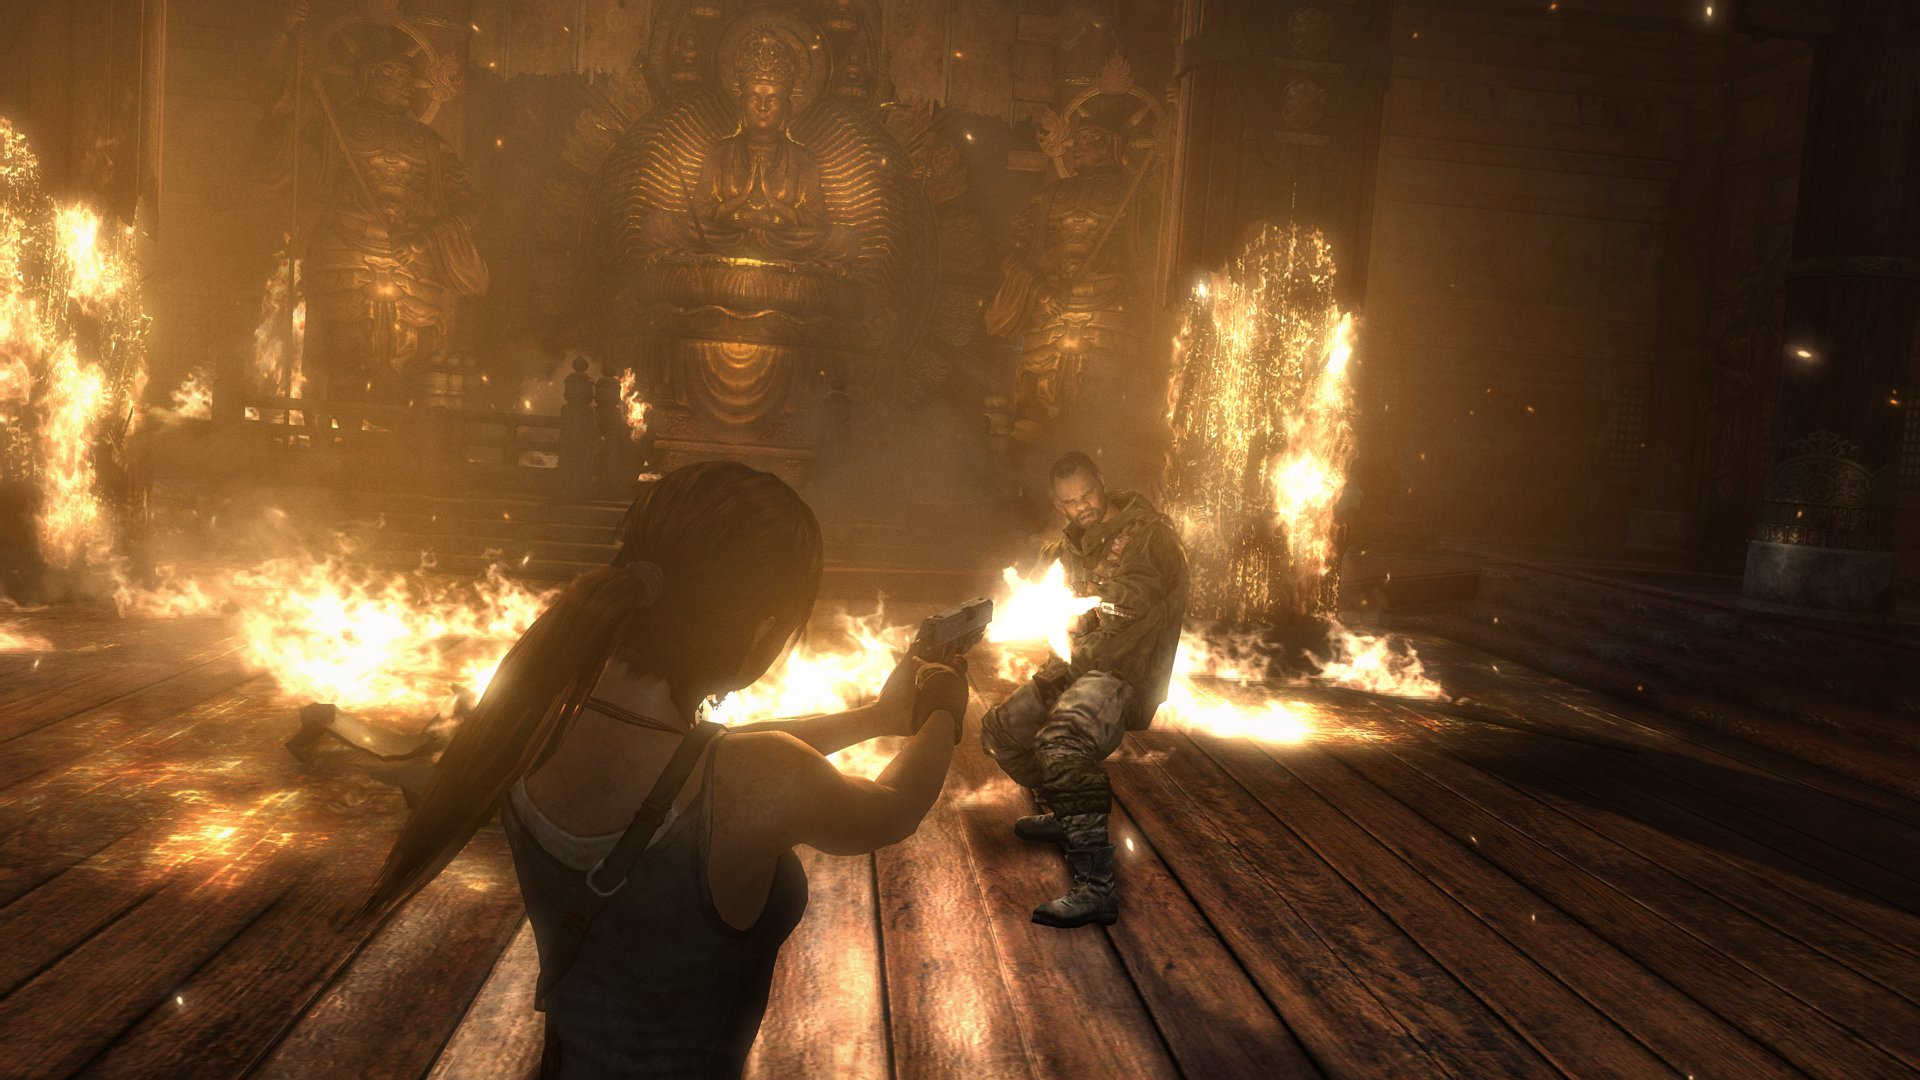 Tomb Raider Screenshots Explore Temple, Fight Samurai #25774